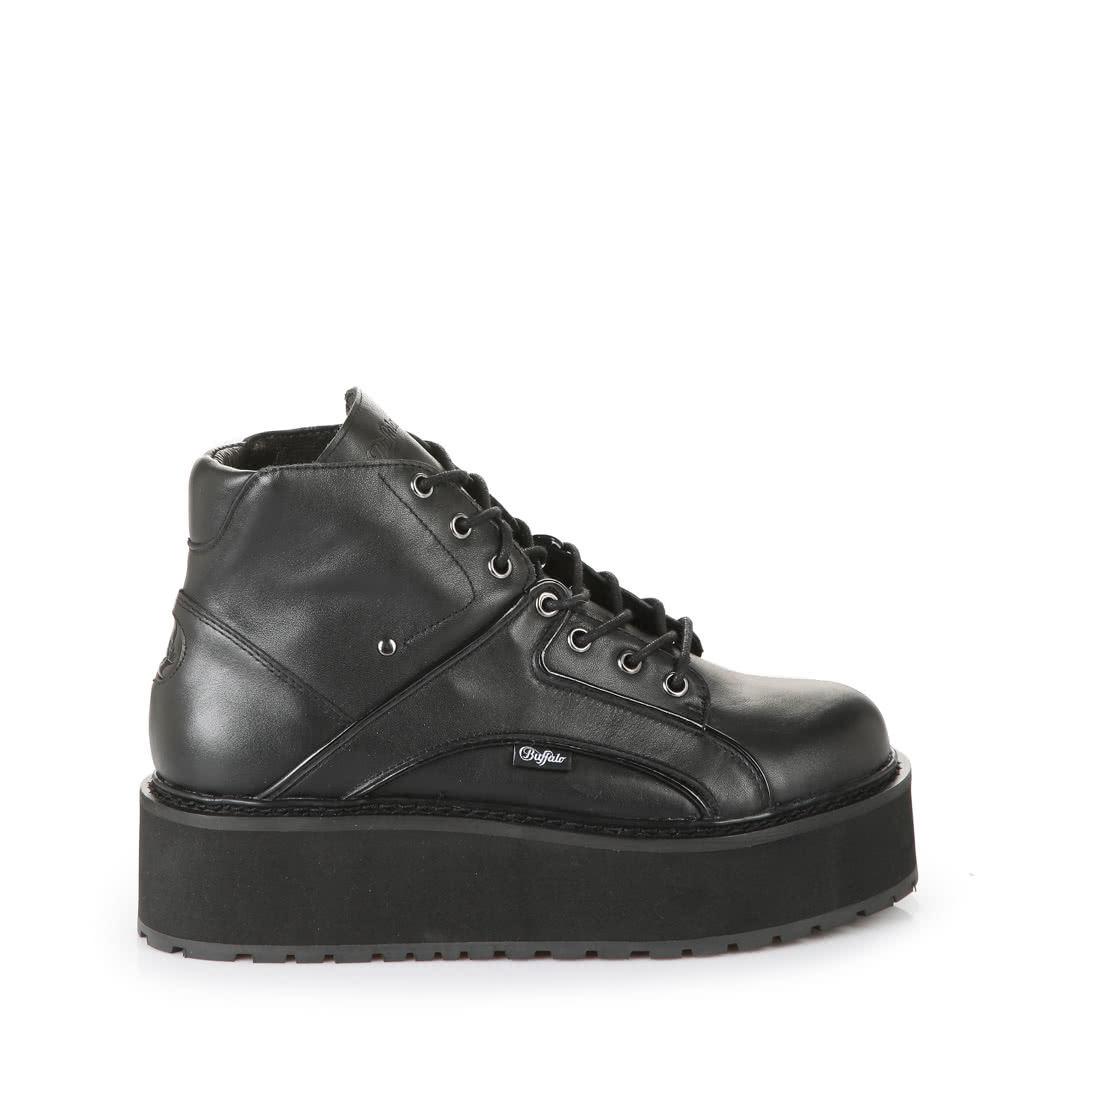 huge selection of 546d9 47d18 Buffalo platform trainers in black buy online in BUFFALO ...